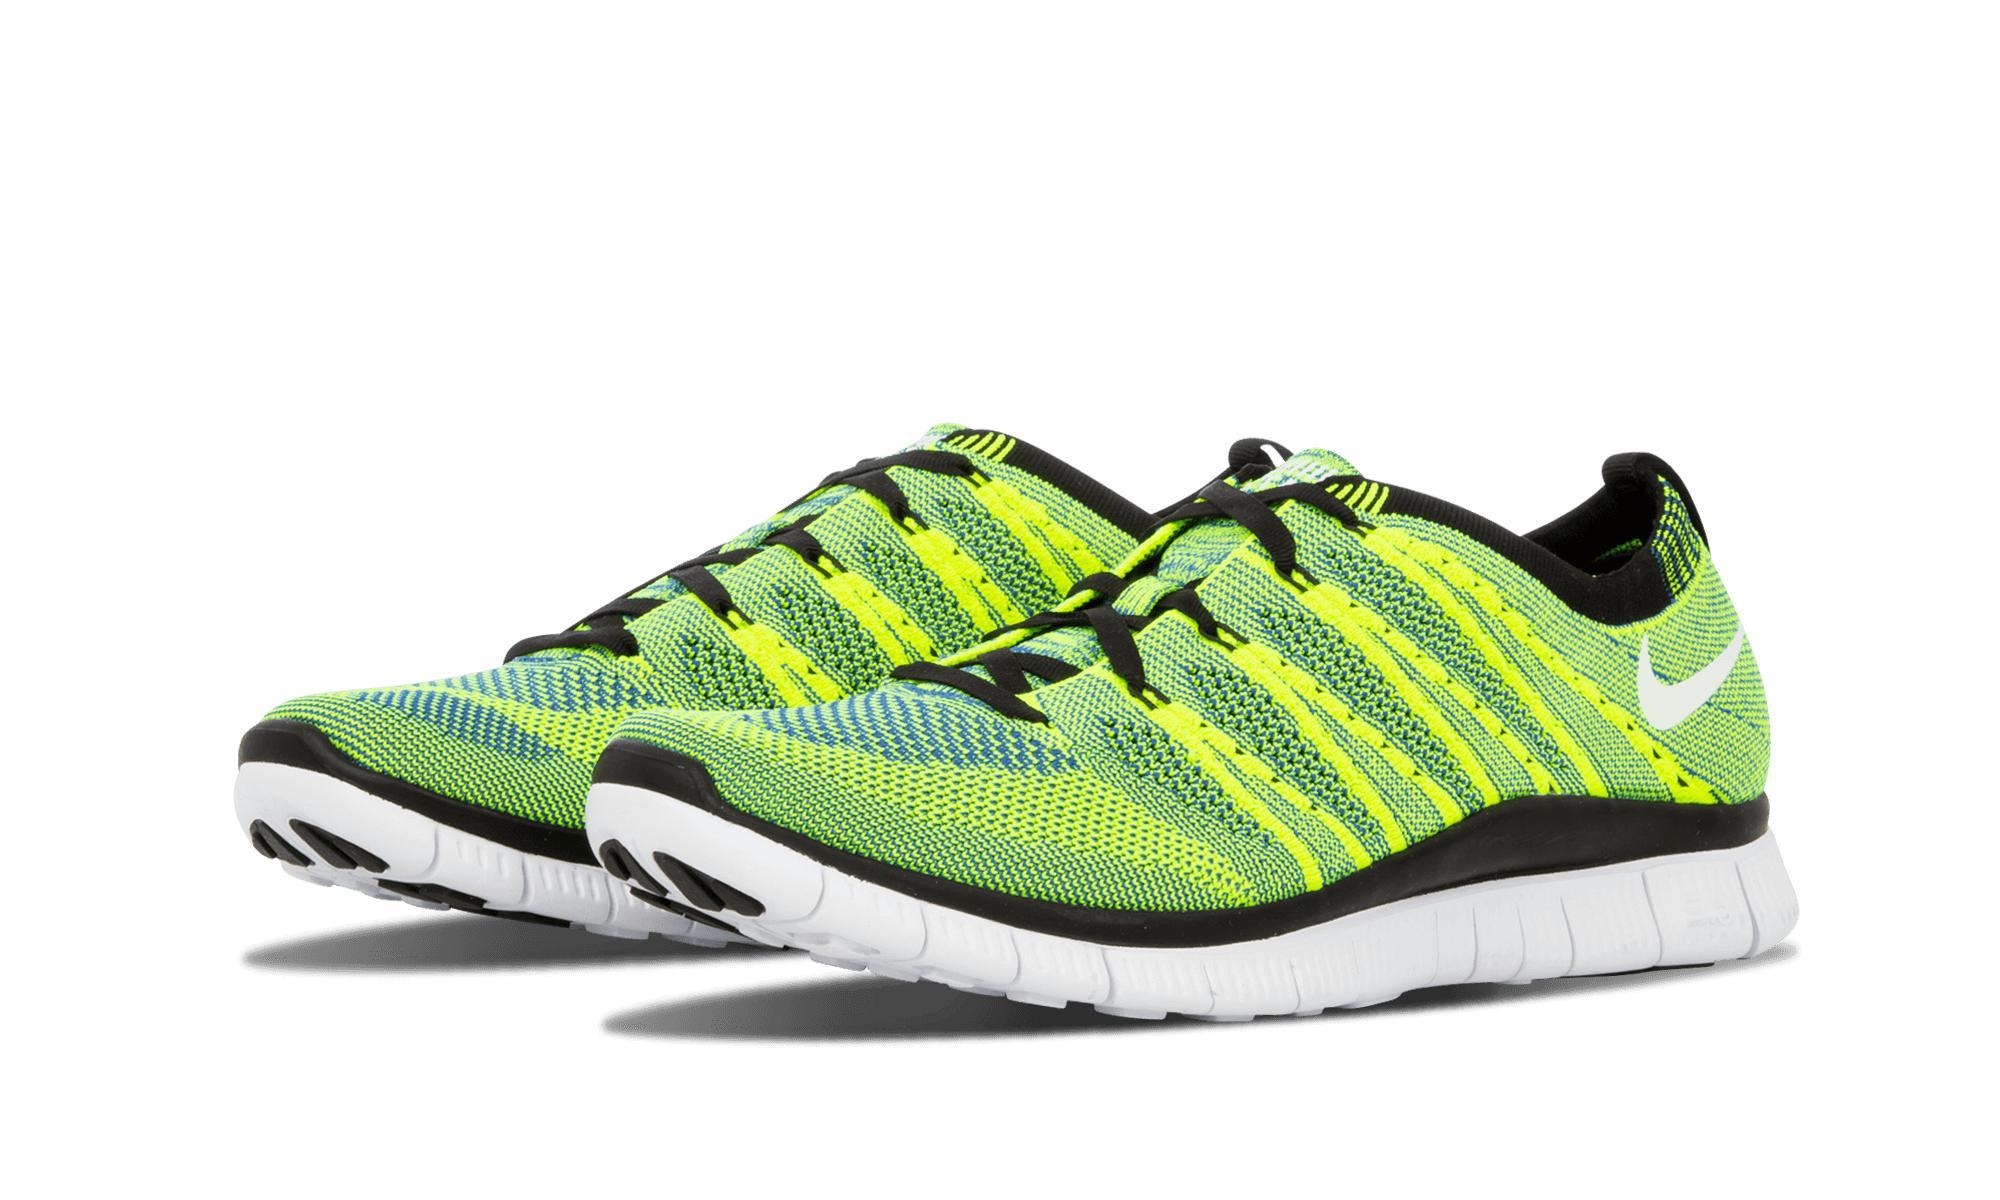 new styles 718d5 66899 Nike - Multicolor Free Flyknit Htm Sp for Men - Lyst. View fullscreen